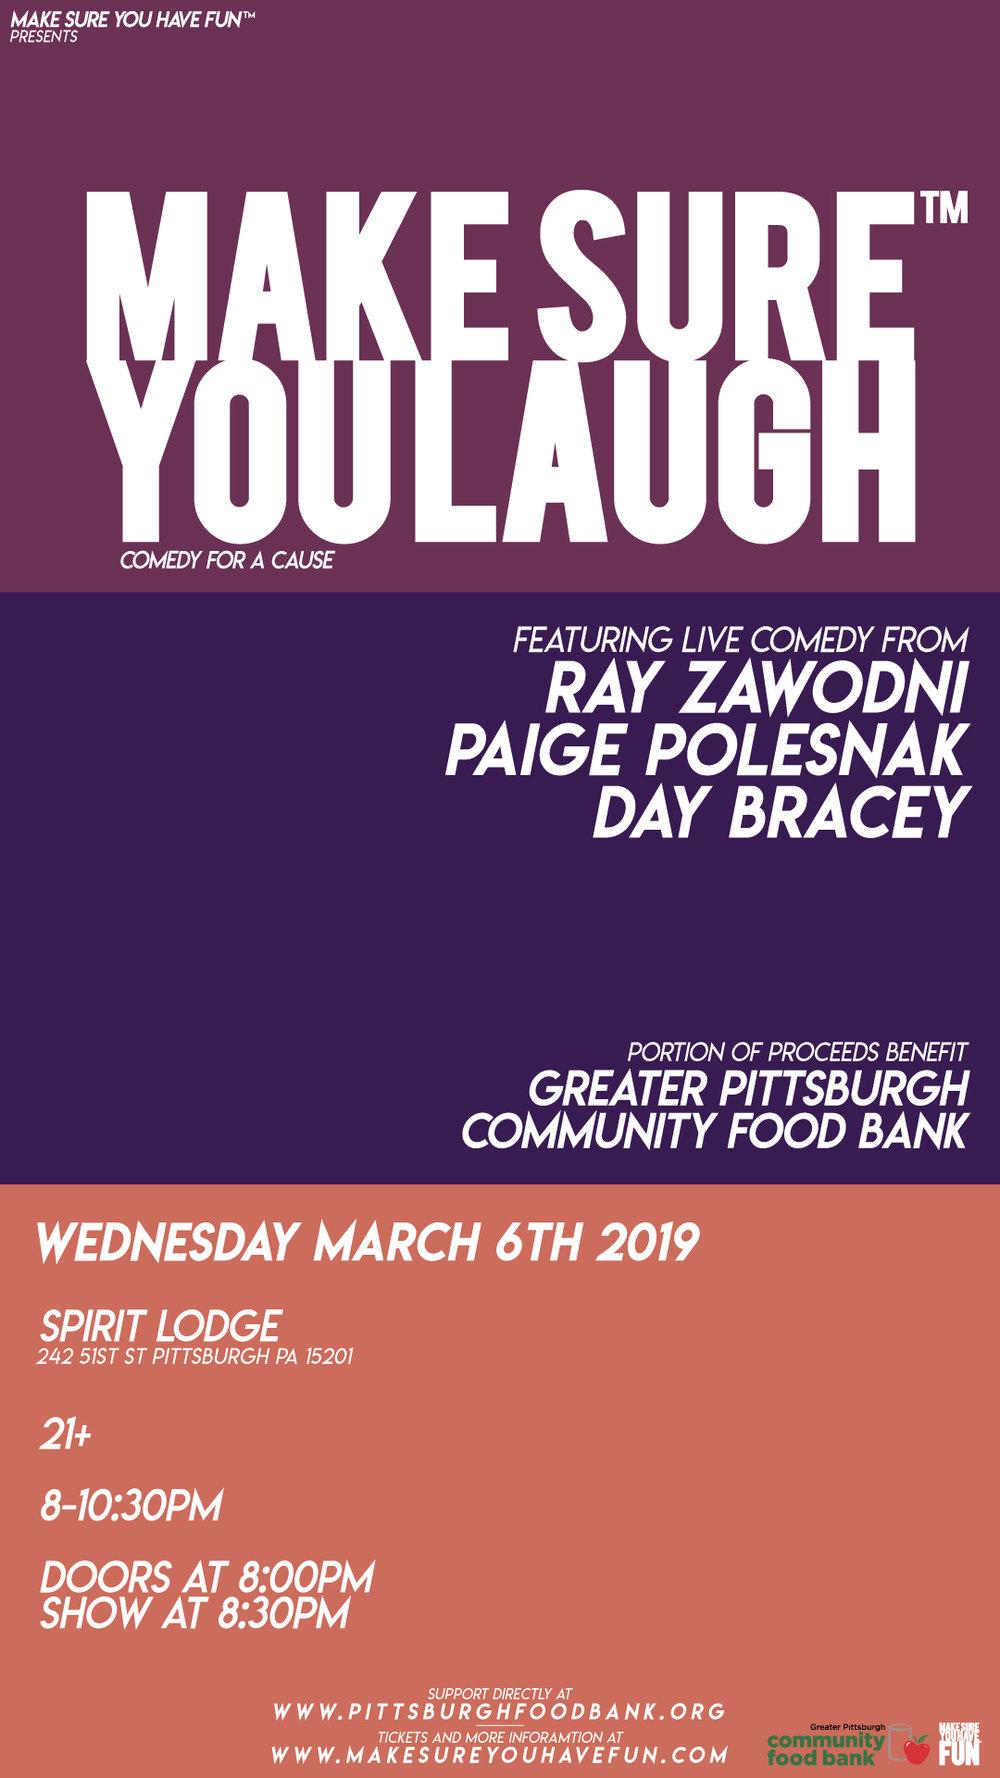 Make-Sure-You-Laugh-March-2019-IG-Story-Flyer.jpg